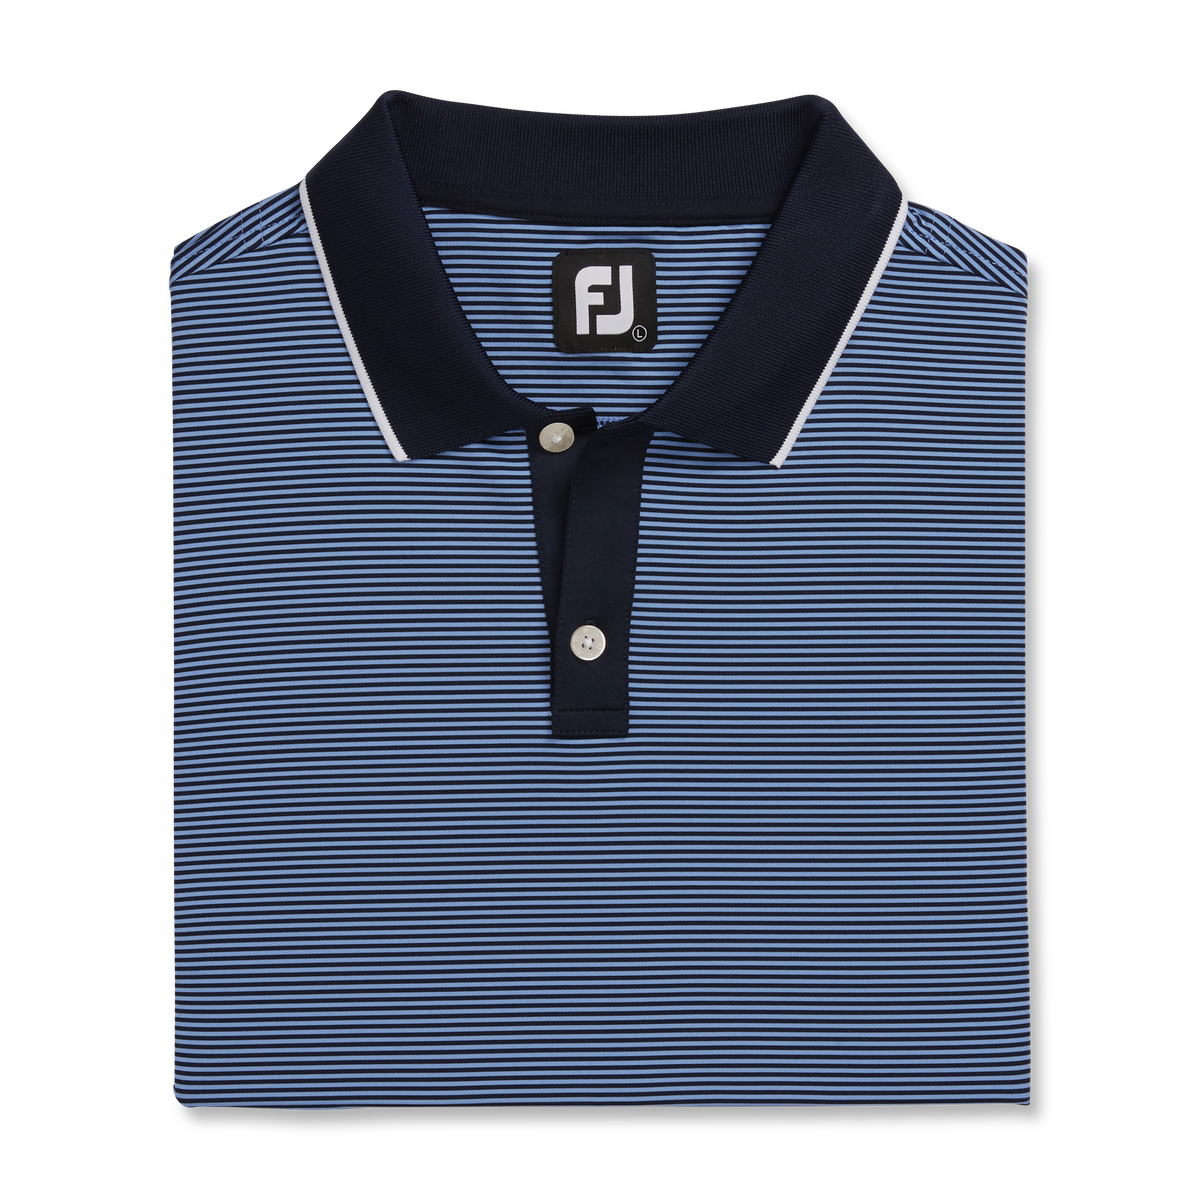 FootJoy Polo: $69